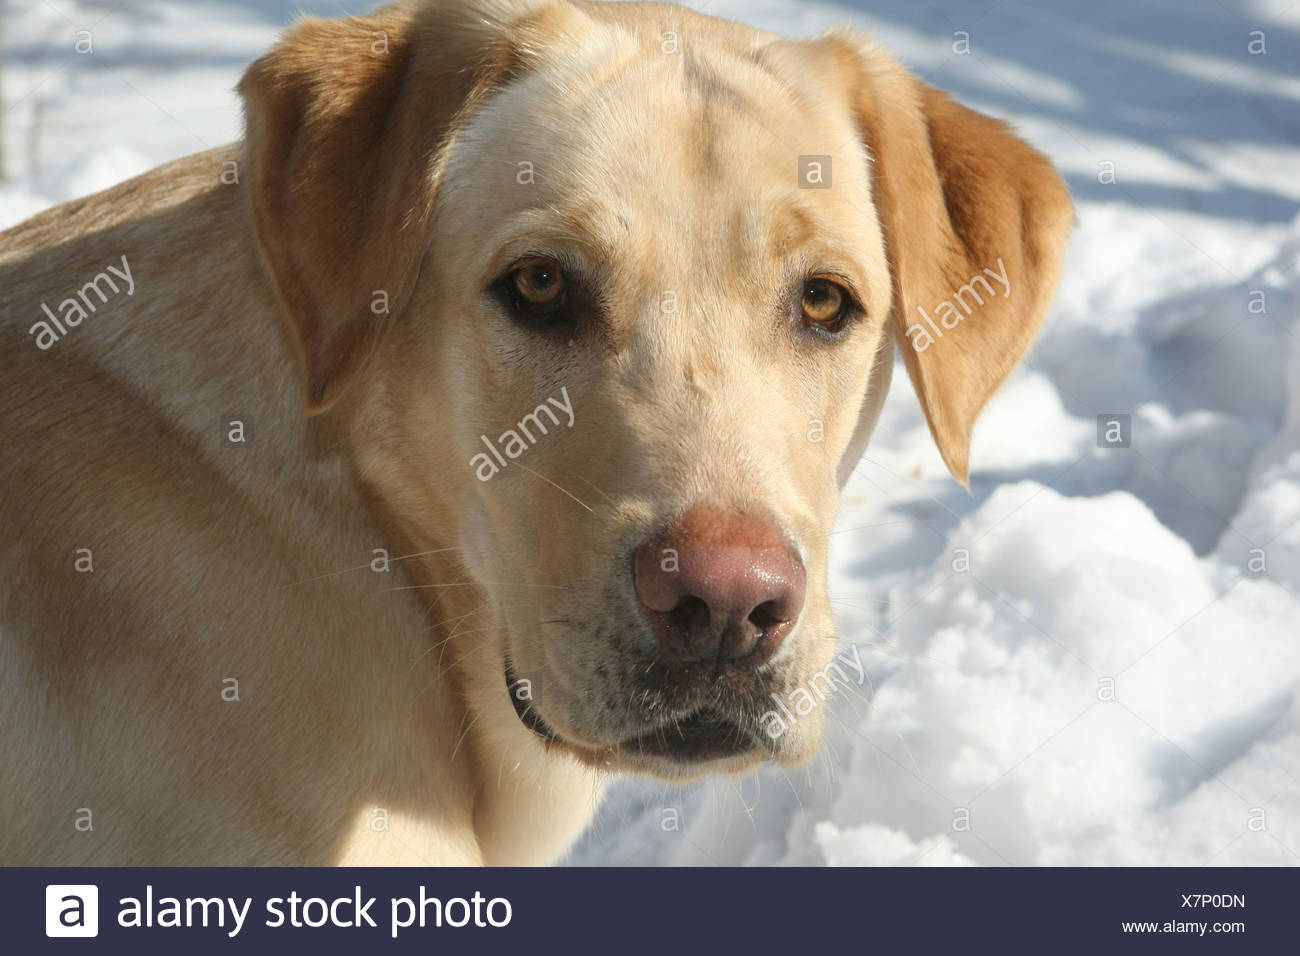 Labrador Retriever Canis Lupus Familiaris Feldberg Feldberger Seenlandschaft Mecklenburg Vorpommern Germany Stock Photo Alamy